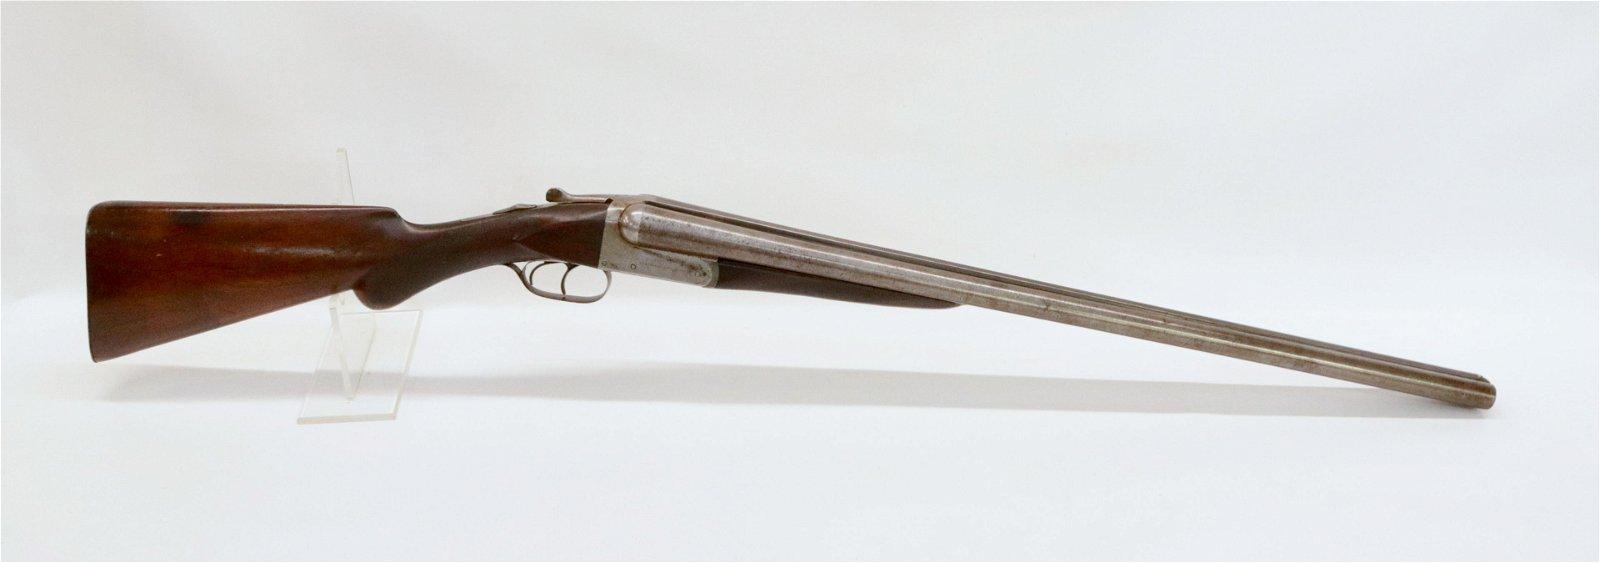 REMINGTON DOUBLE BARREL SHOTGUN